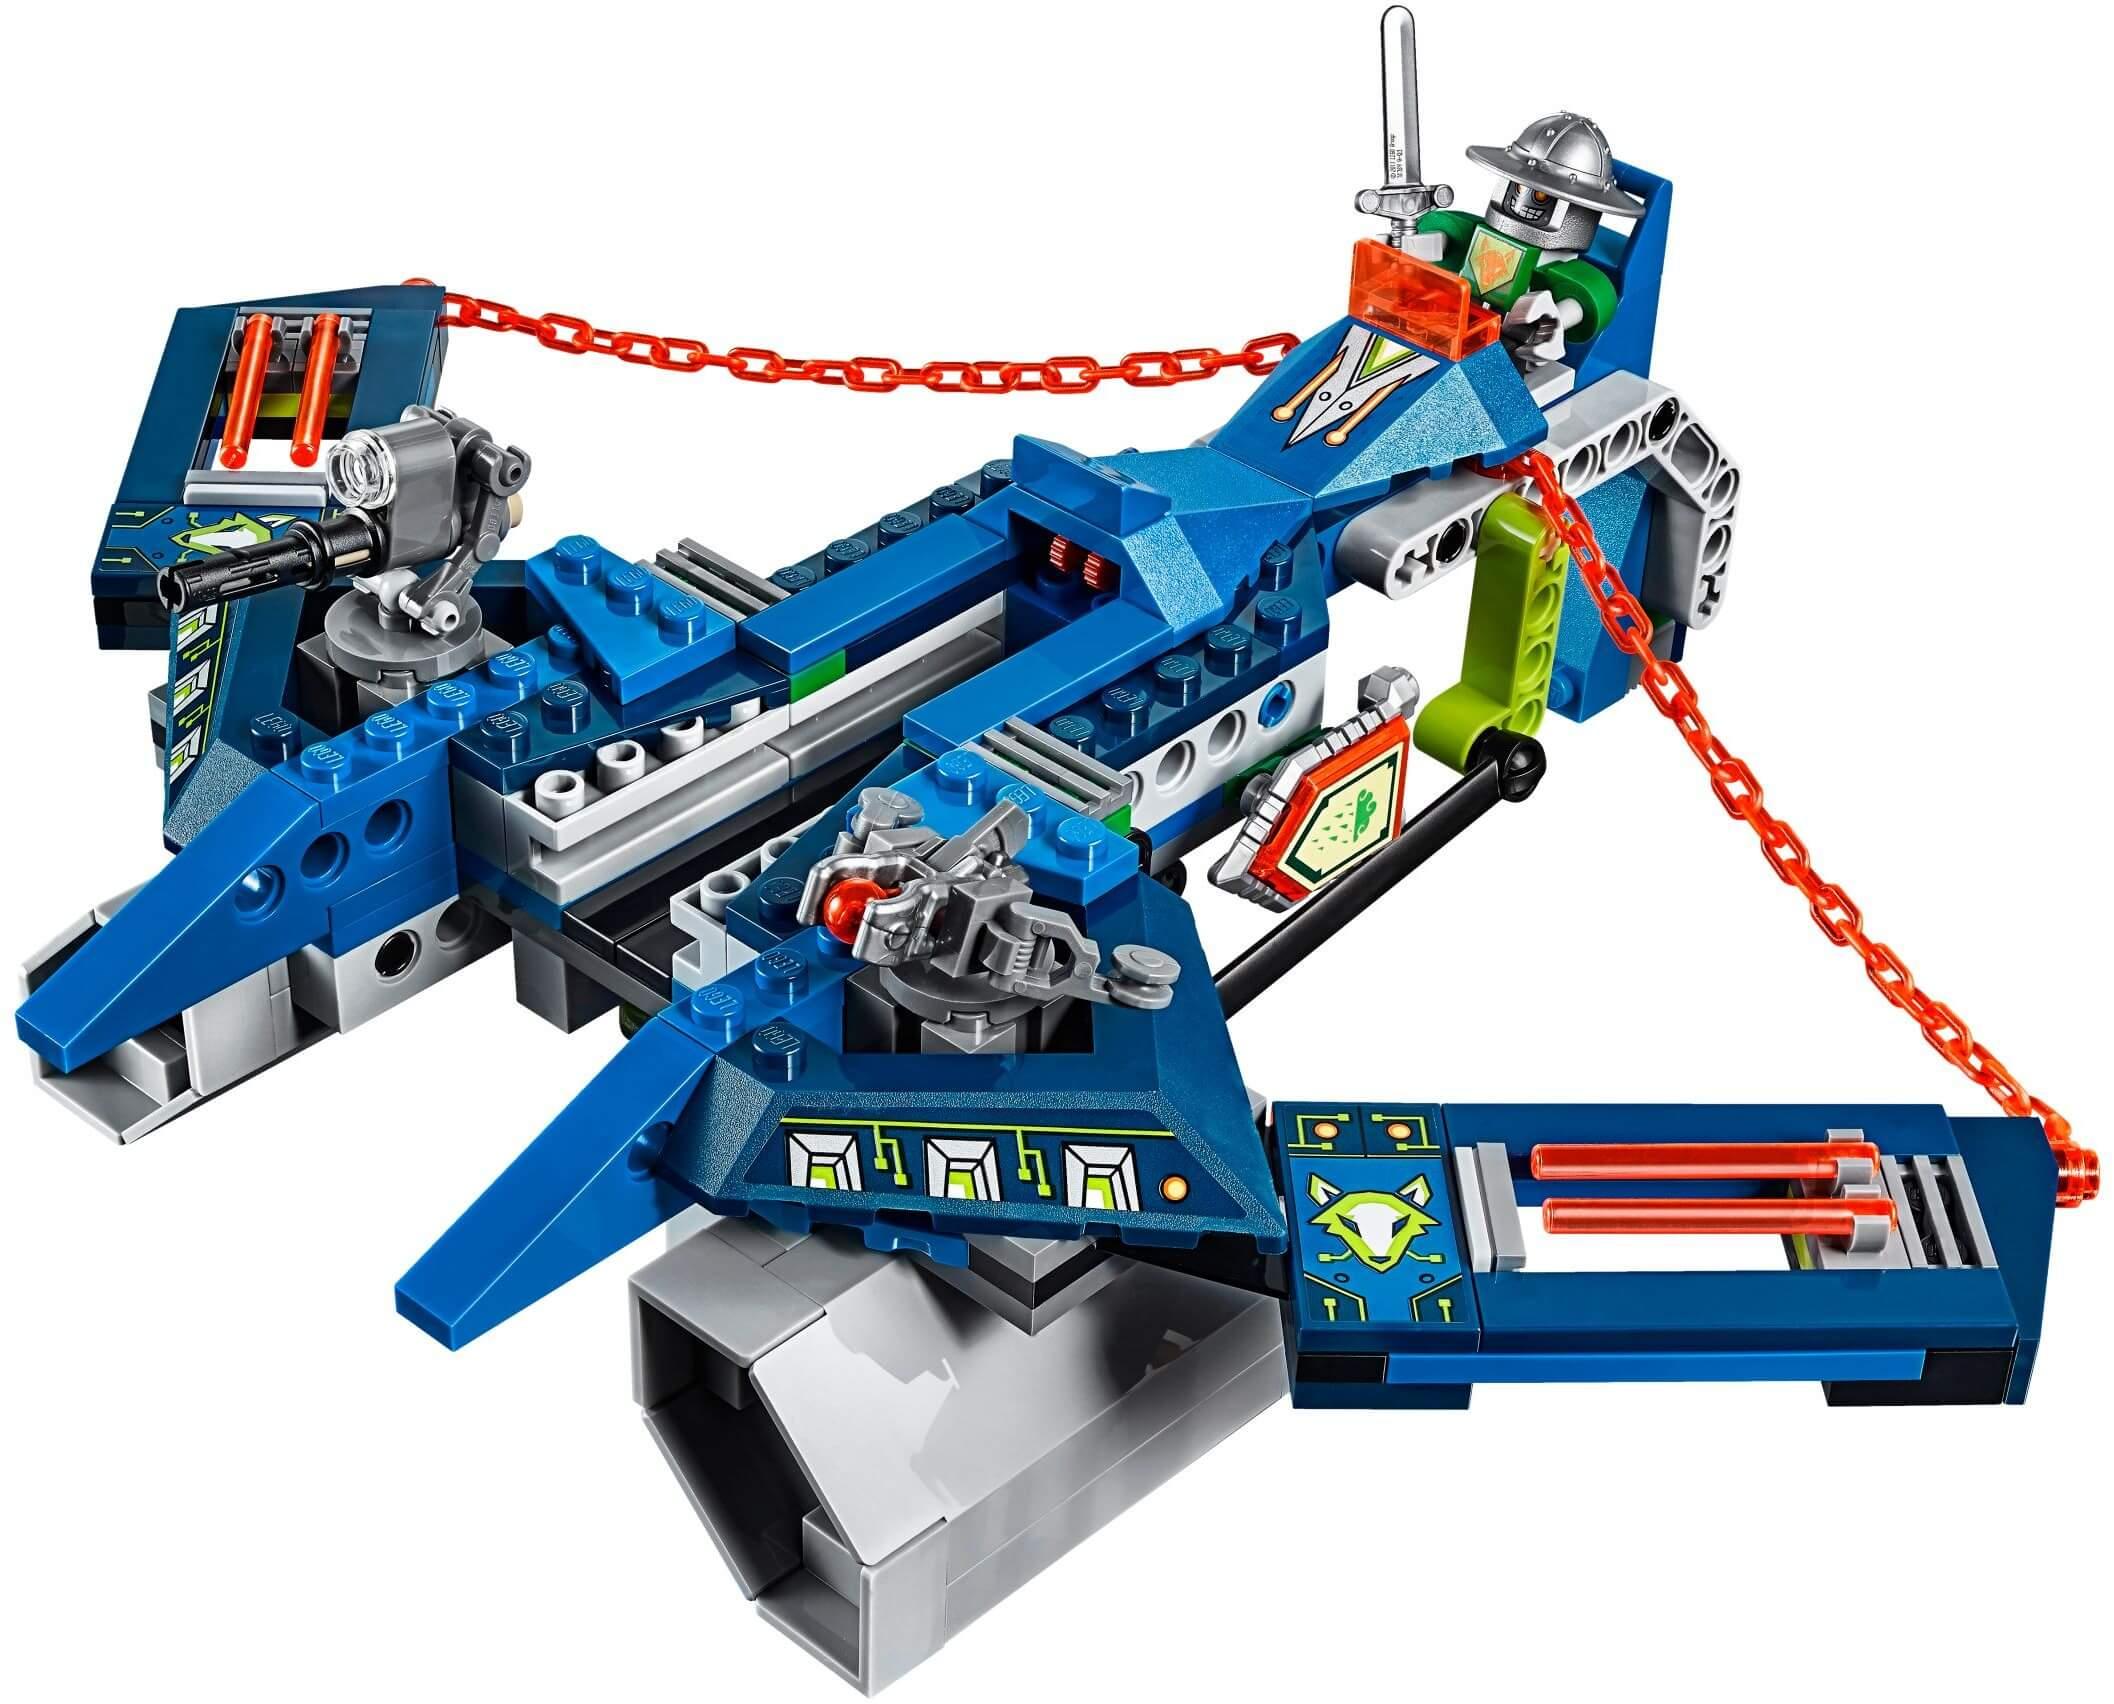 Mua đồ chơi LEGO 70320 - LEGO Nexo Knights 70320 - Siêu Máy Bay Hỏa Tiễn của Aaron (LEGO Nexo Knights Aaron Fox's Aero-Striker V2 70320)